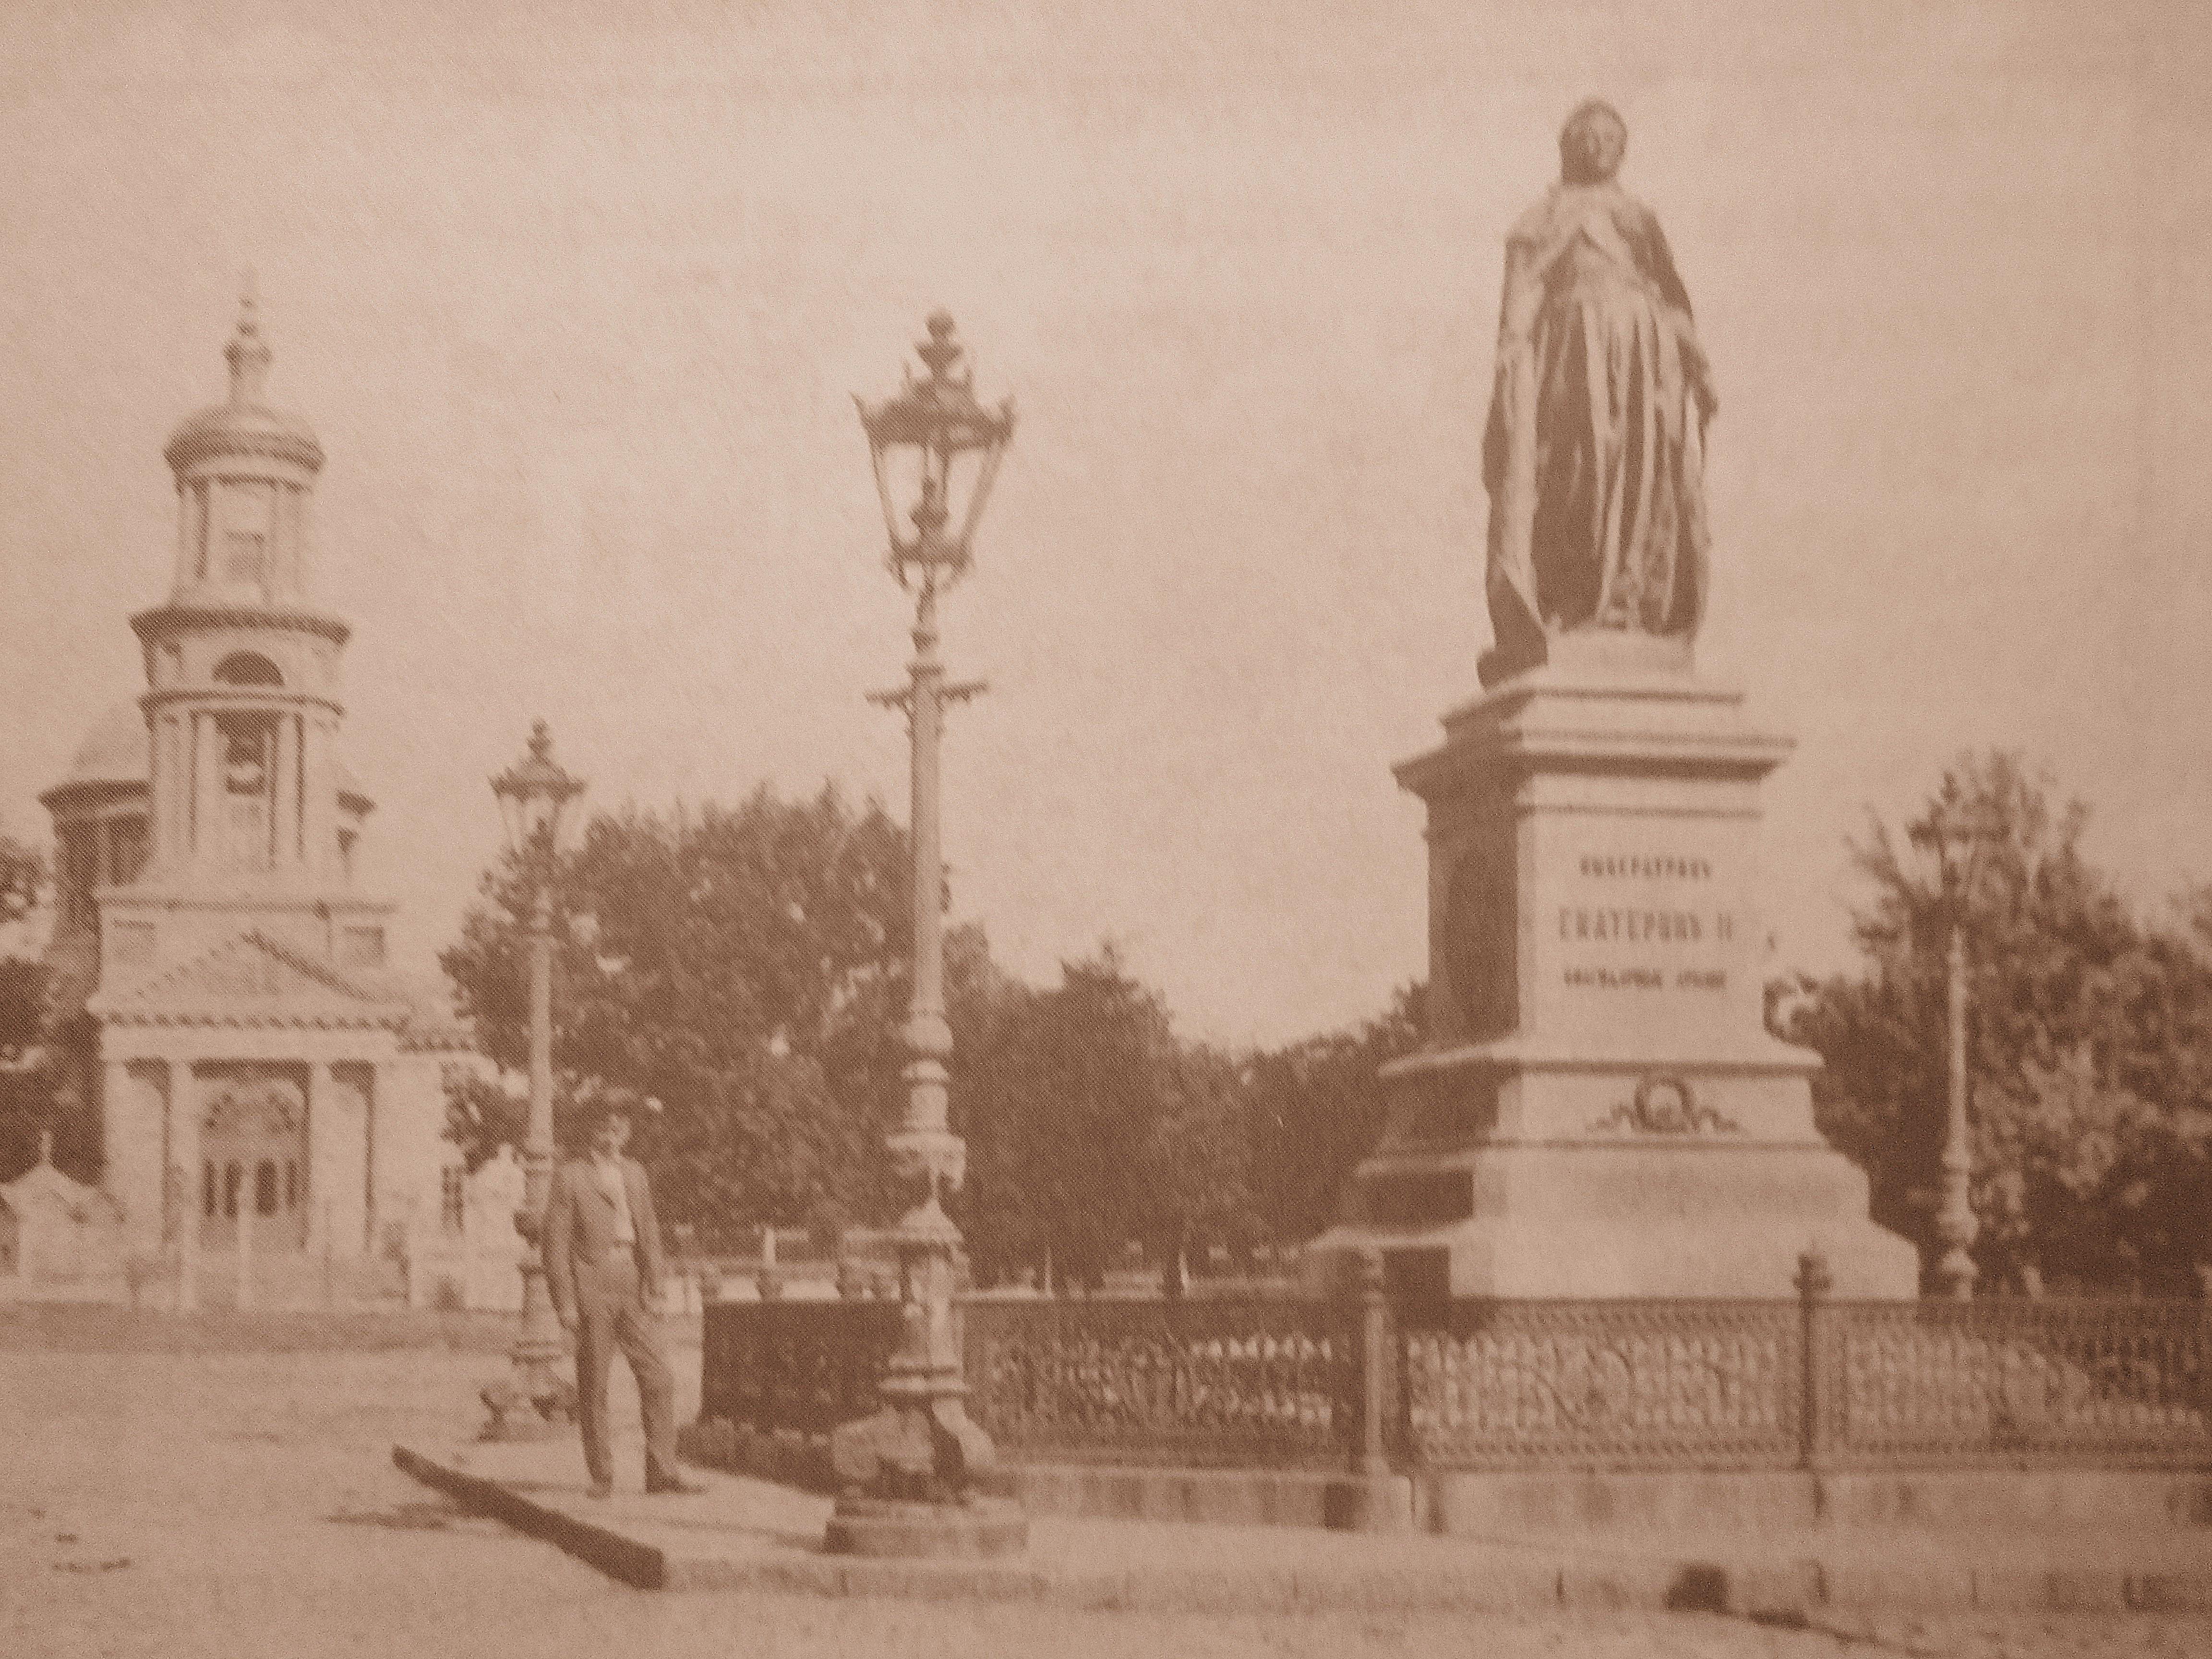 Памятник Еатерине II.1 (2)